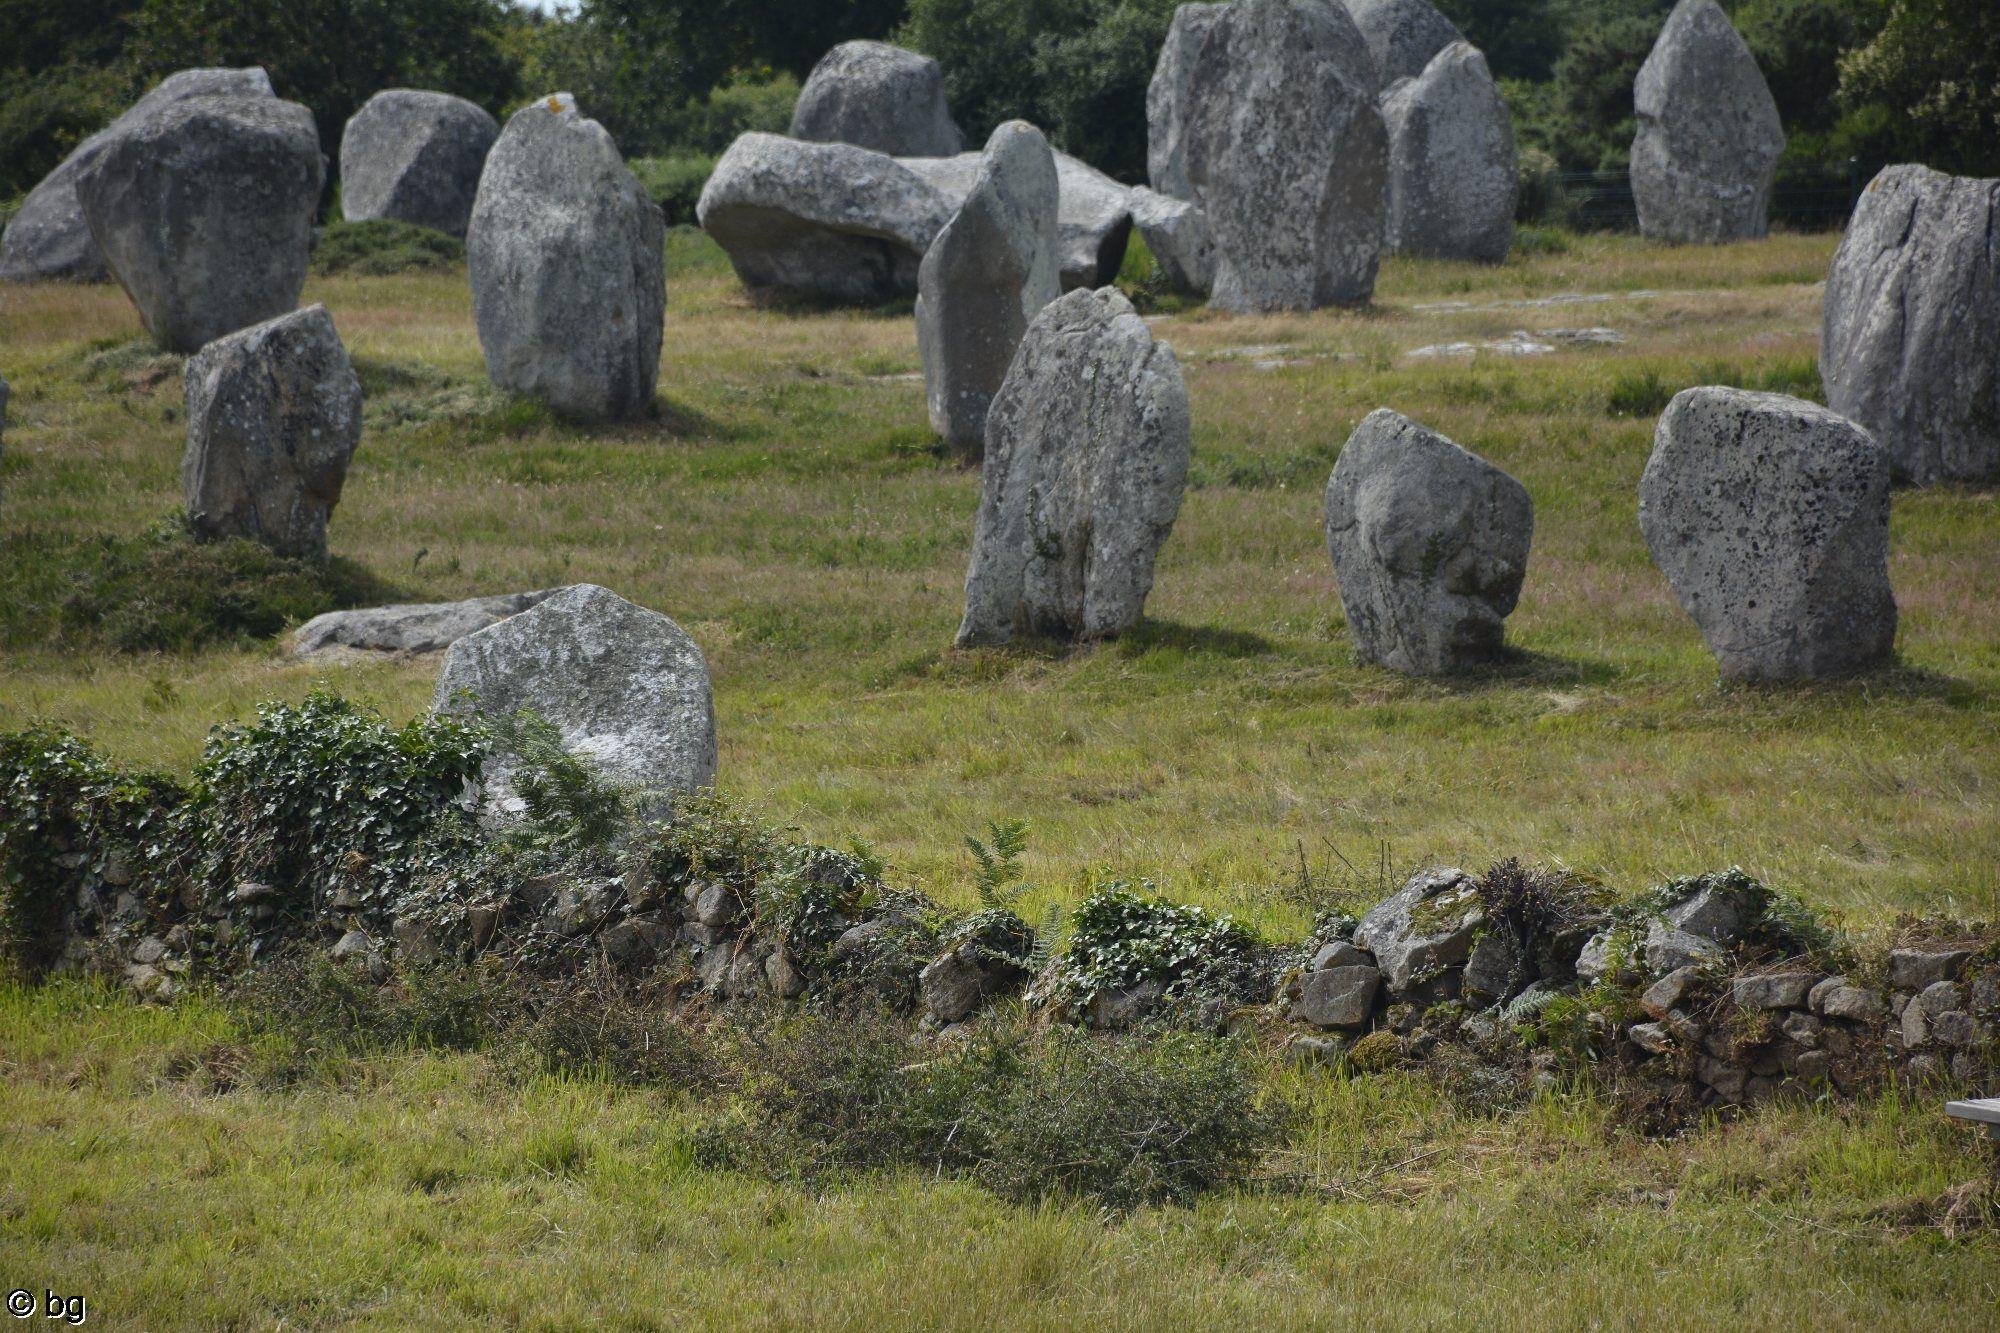 alignements-megalithiques-carnac-bgretagne-2